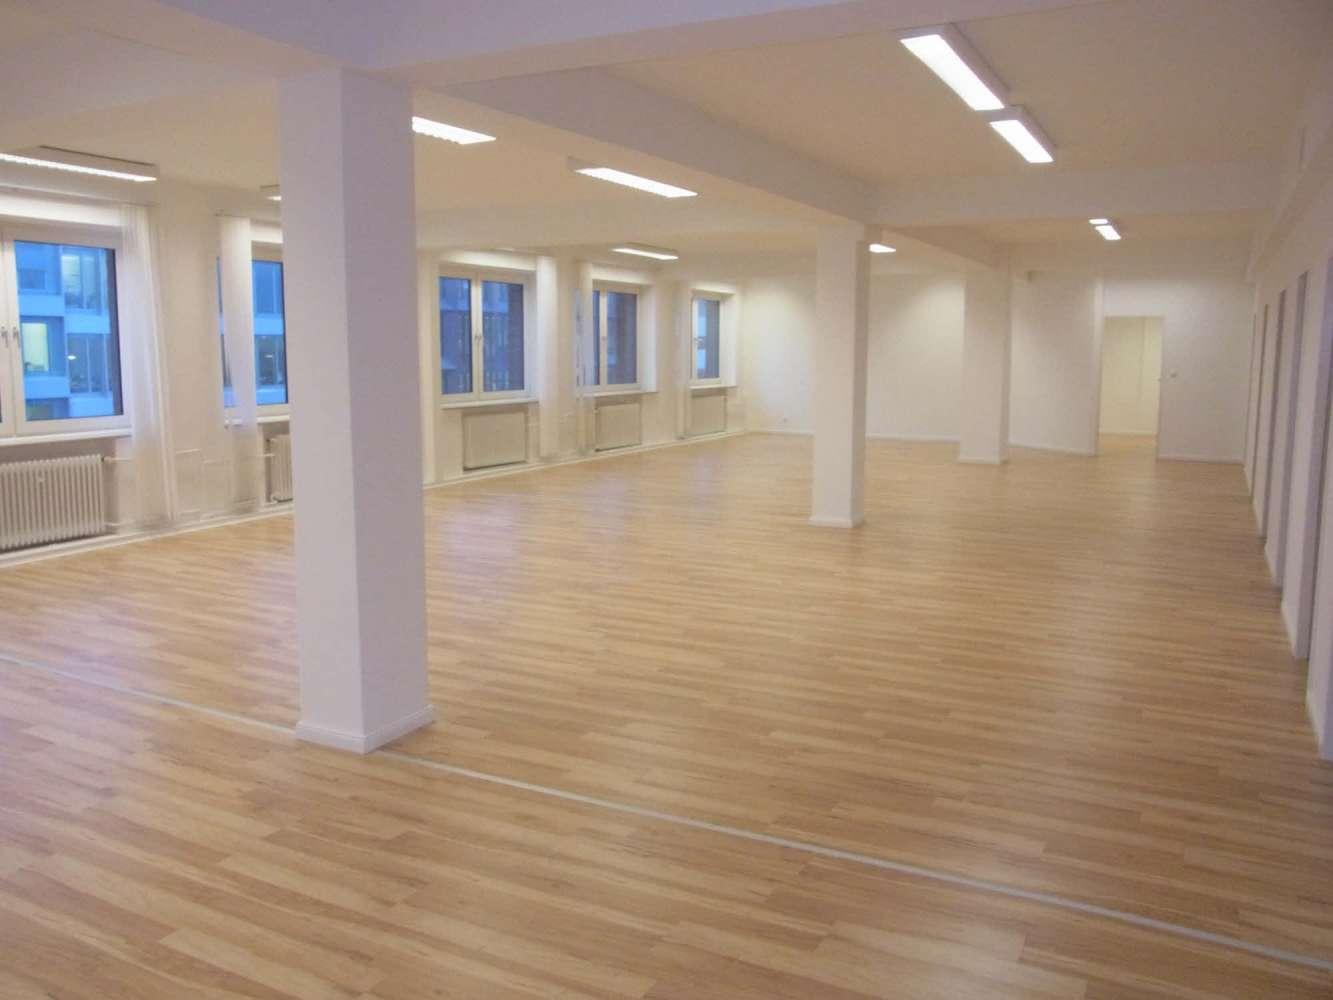 Büros Hamburg, 20459 - Büro - Hamburg, Hamburg-Altstadt - H1480 - 10442812